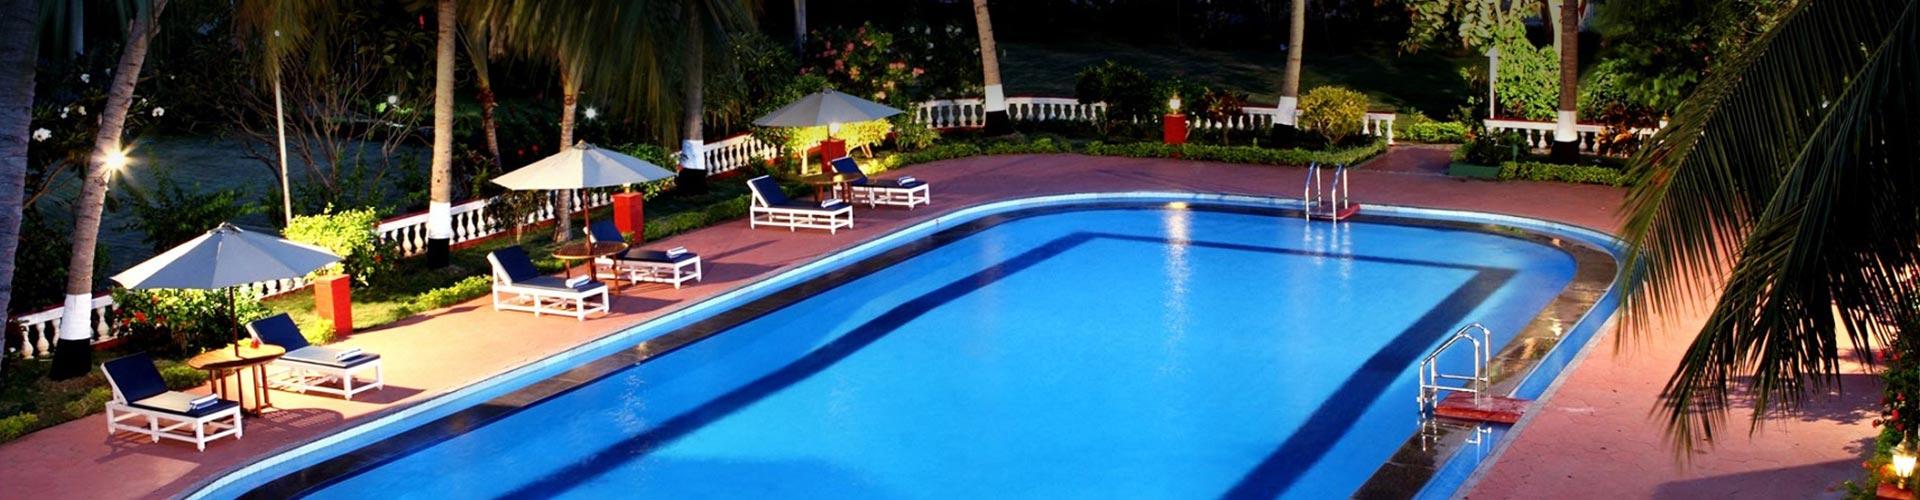 Ideal Riverview Resort